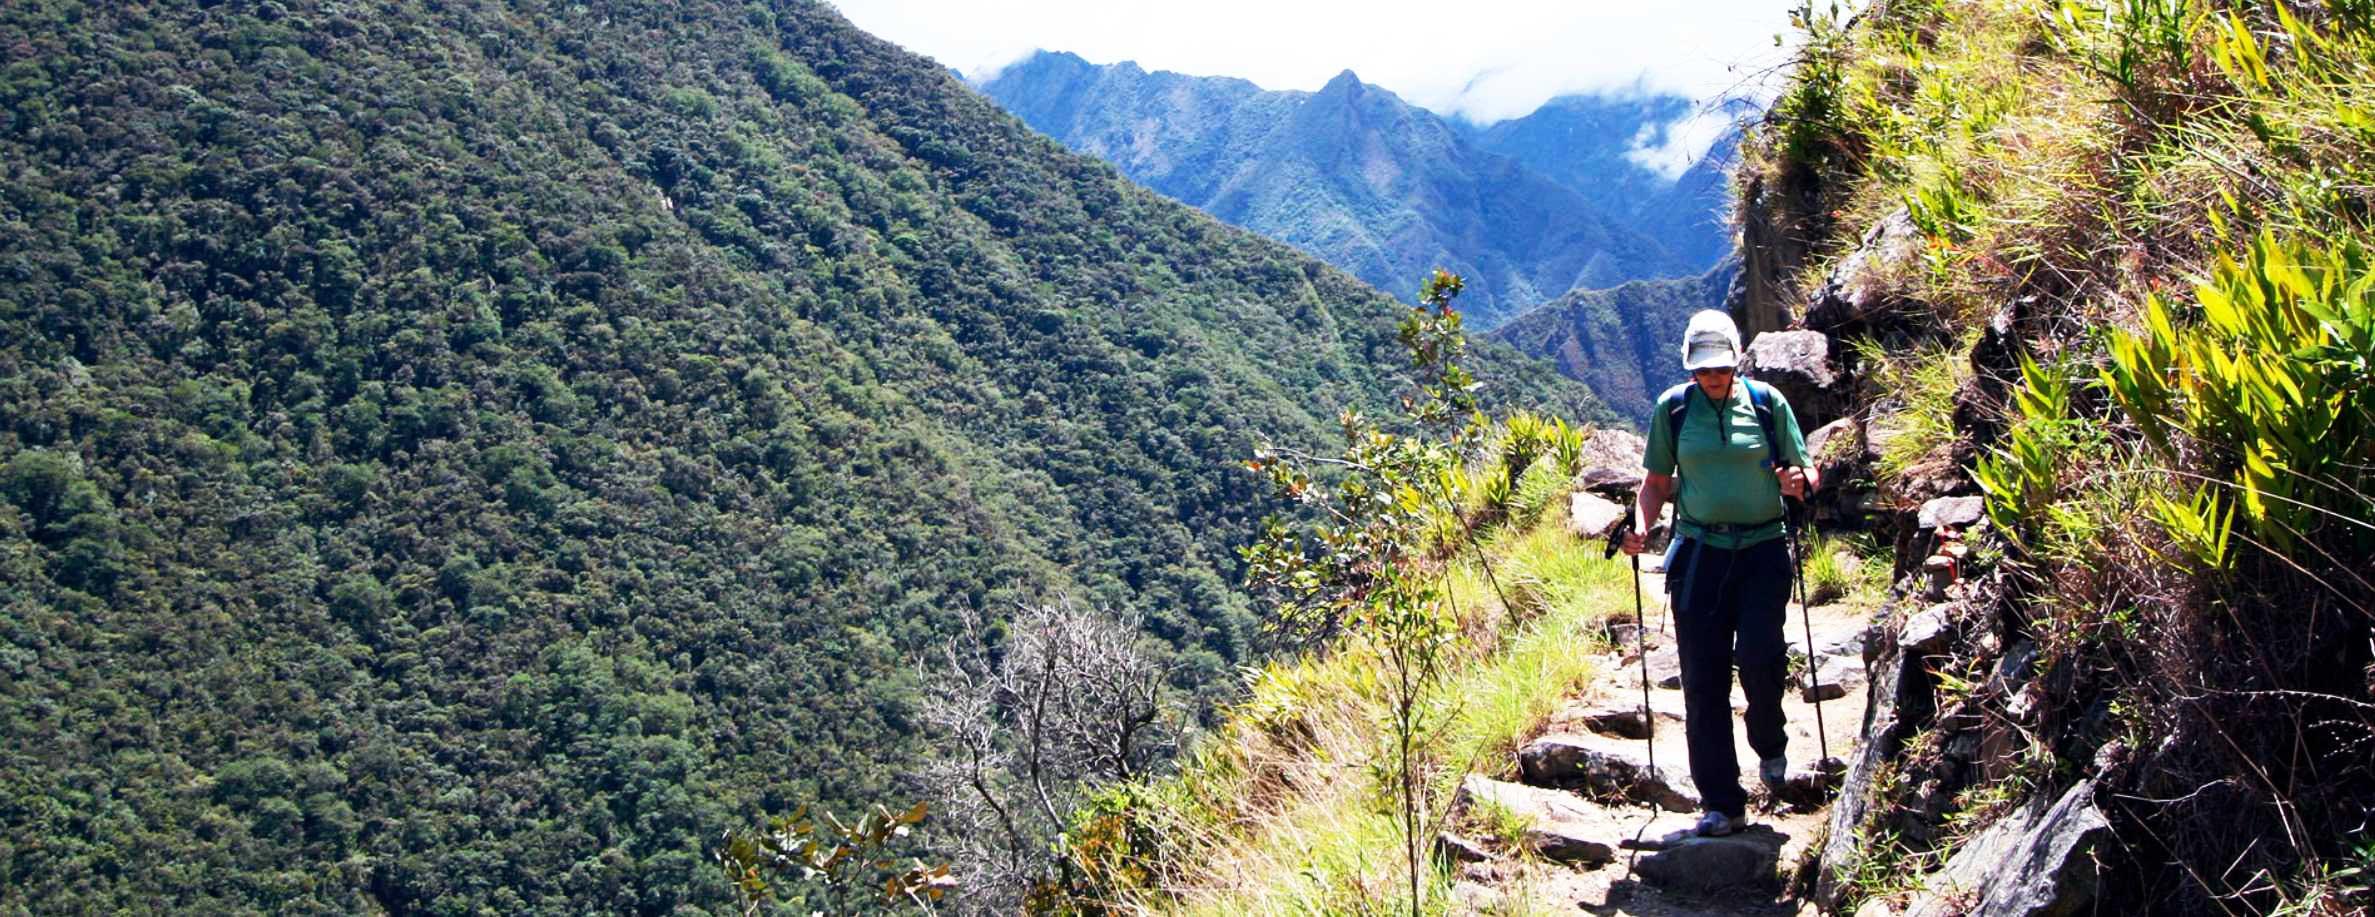 short inca trail to machu picchu 1 day